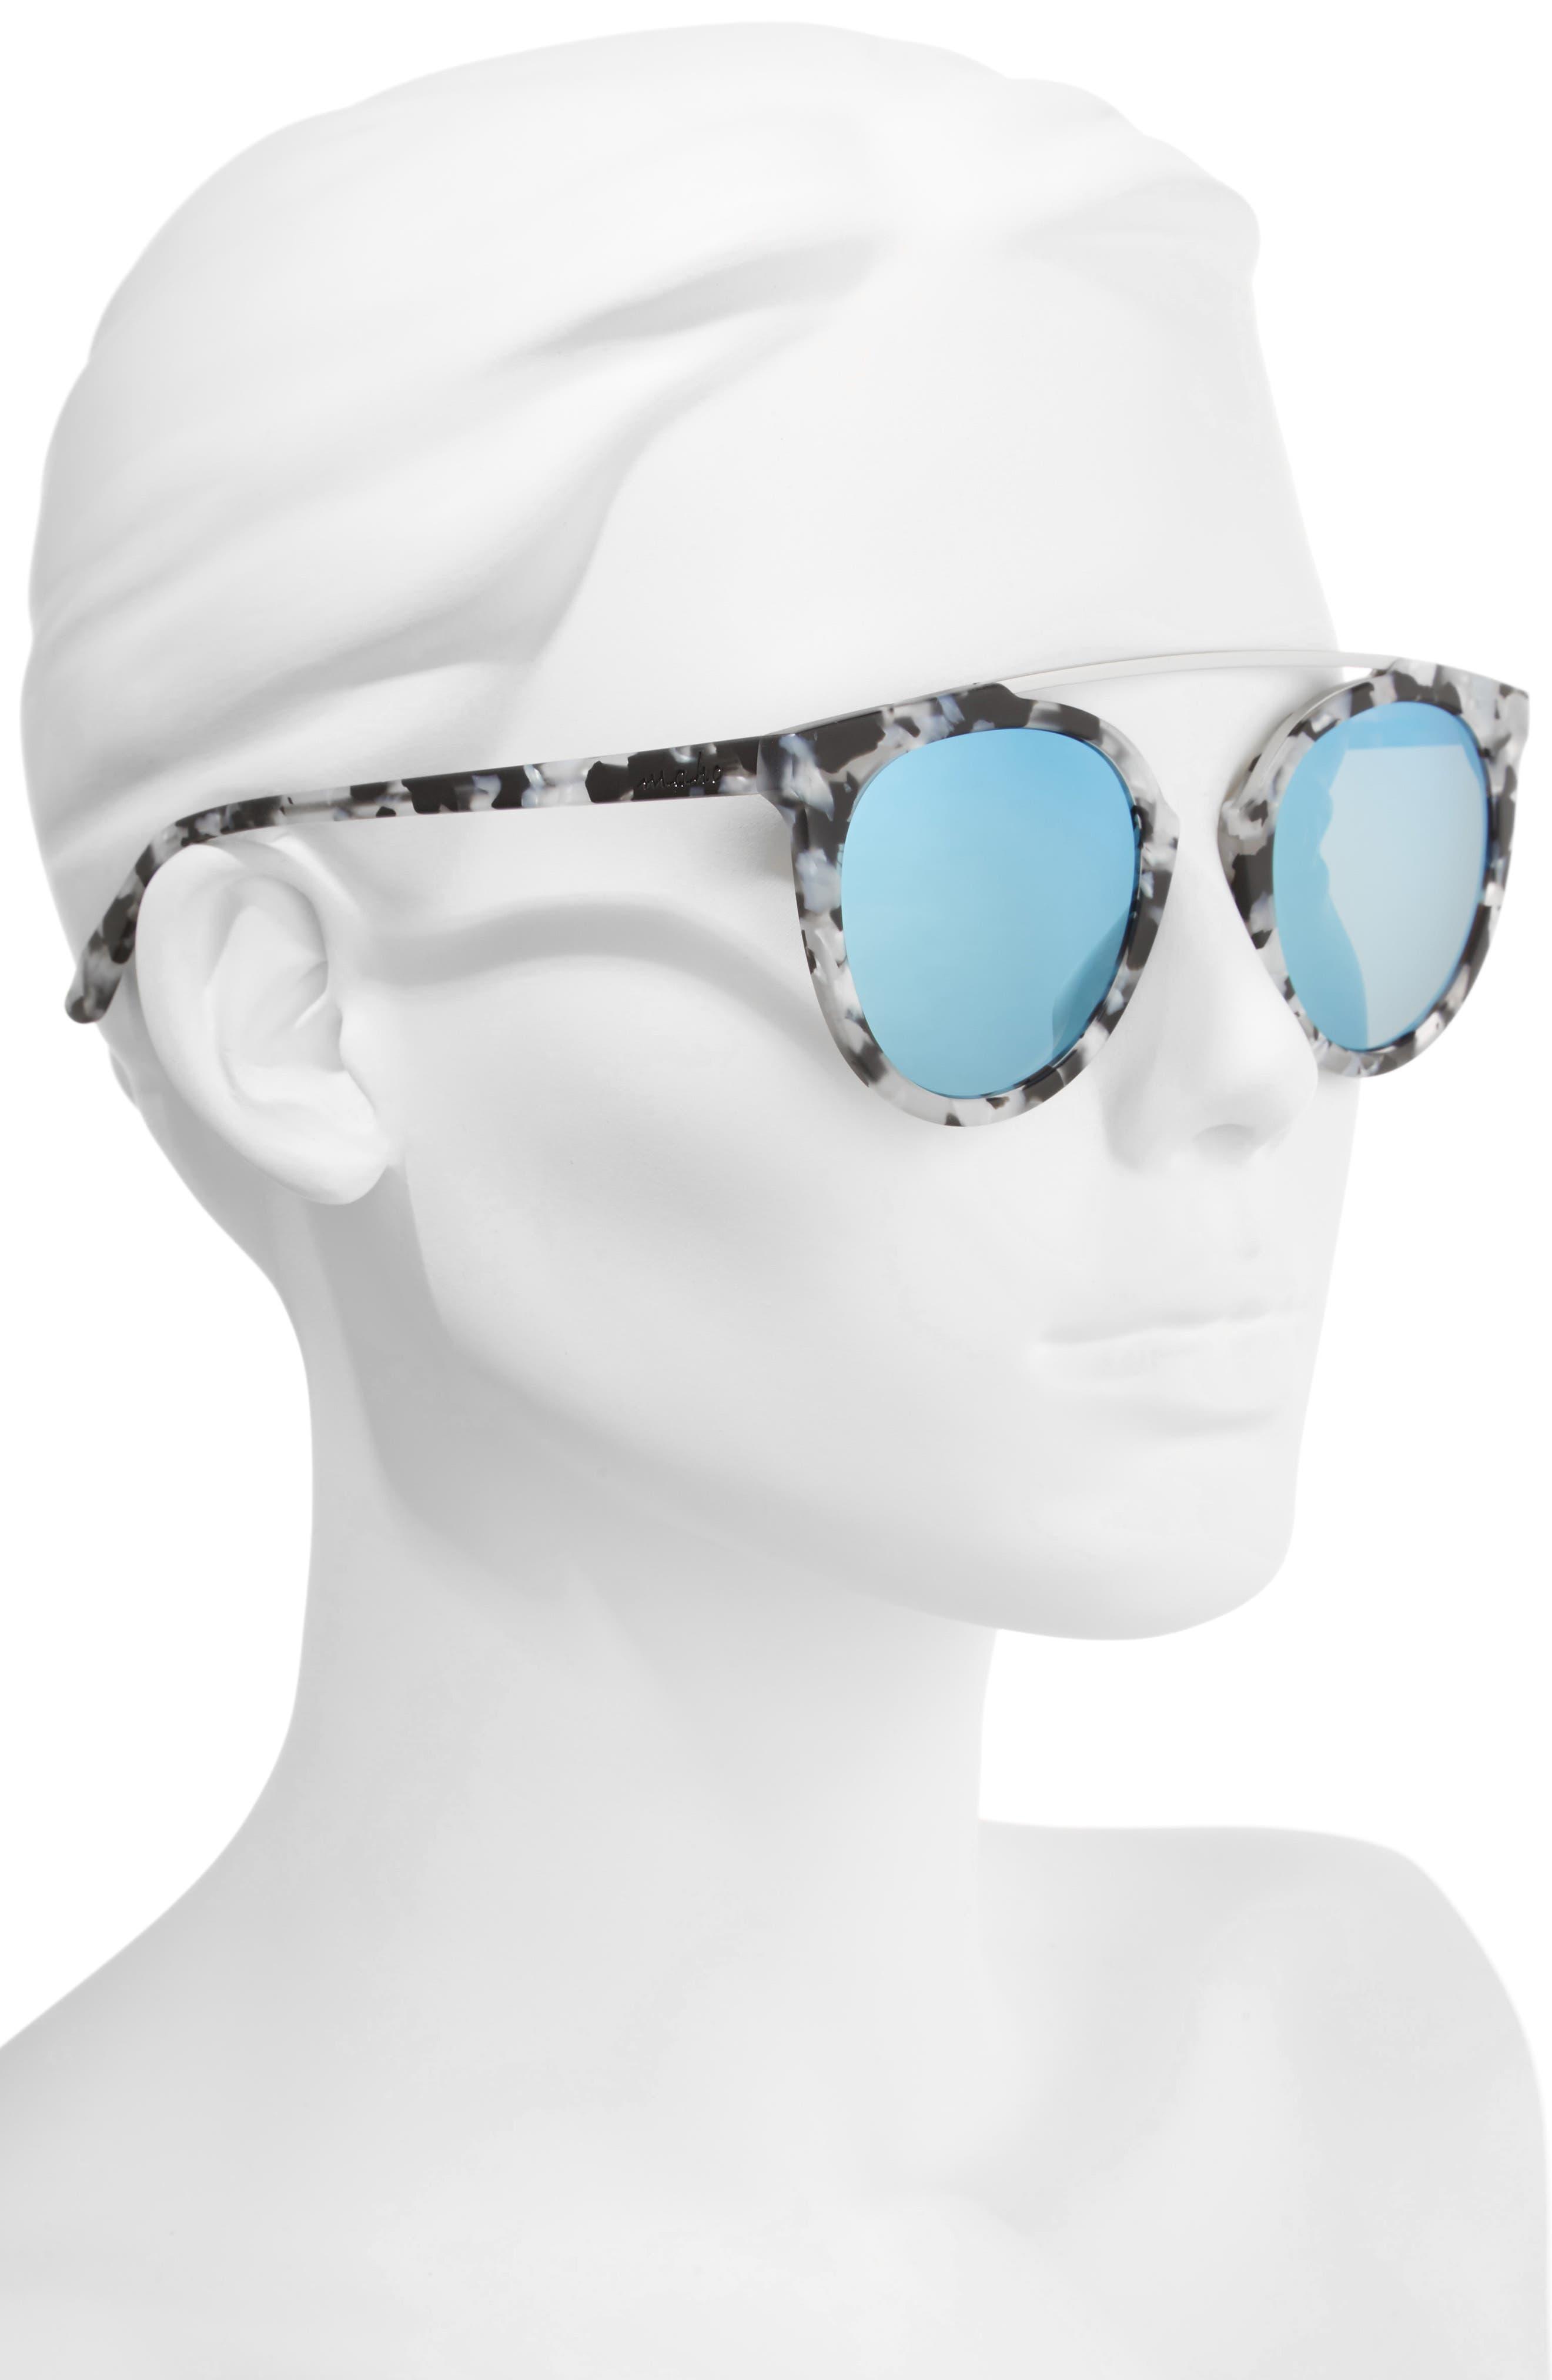 Key West 50mm Polarized Aviator Sunglasses,                             Alternate thumbnail 2, color,                             Marble